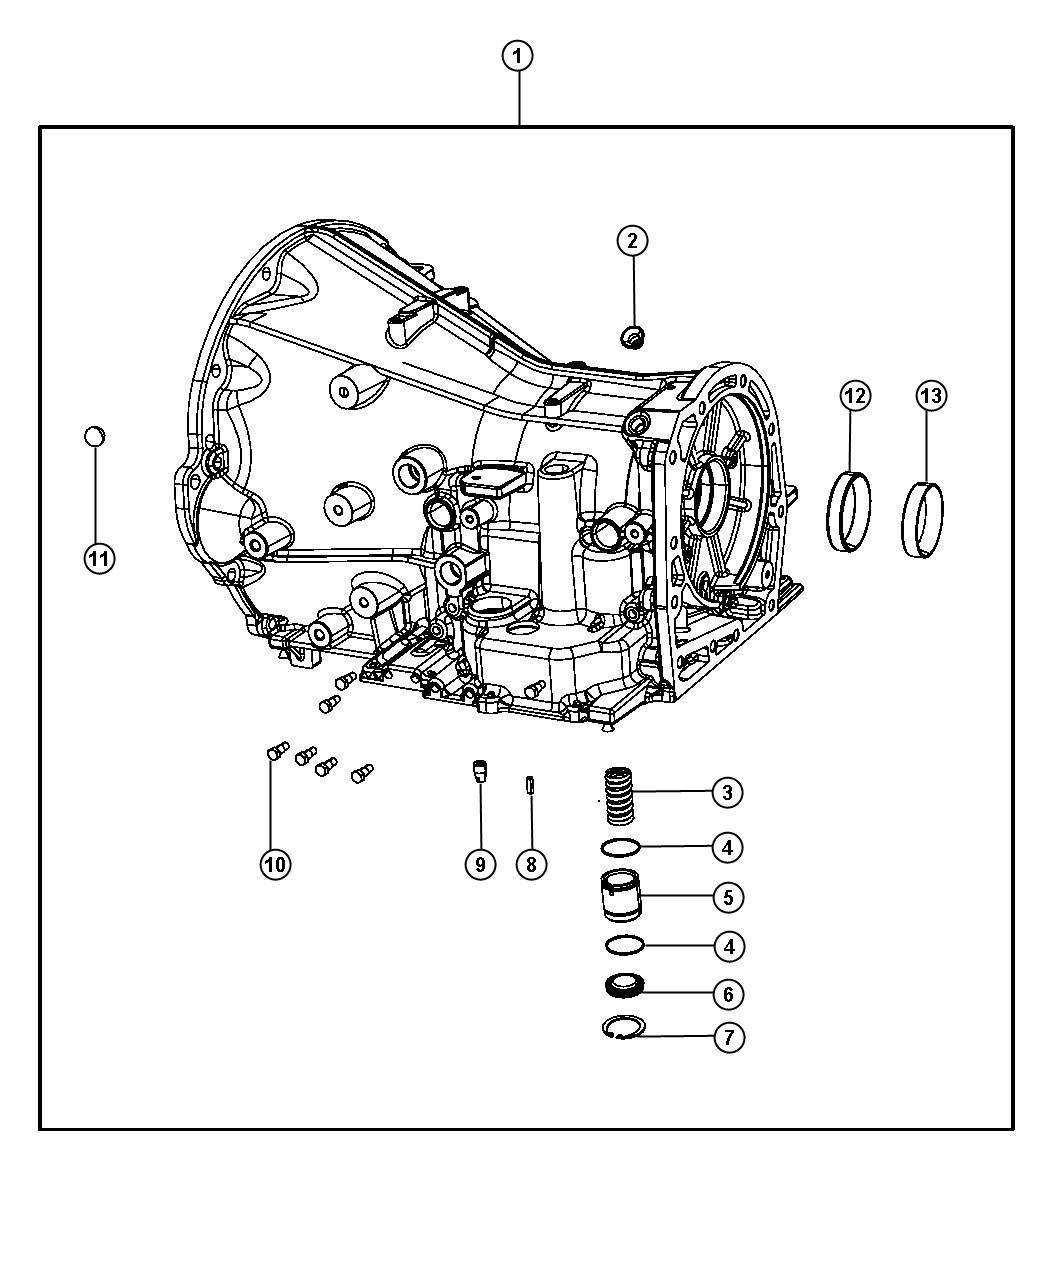 2006 Chrysler 300 Case. Transmission - 68003762AA